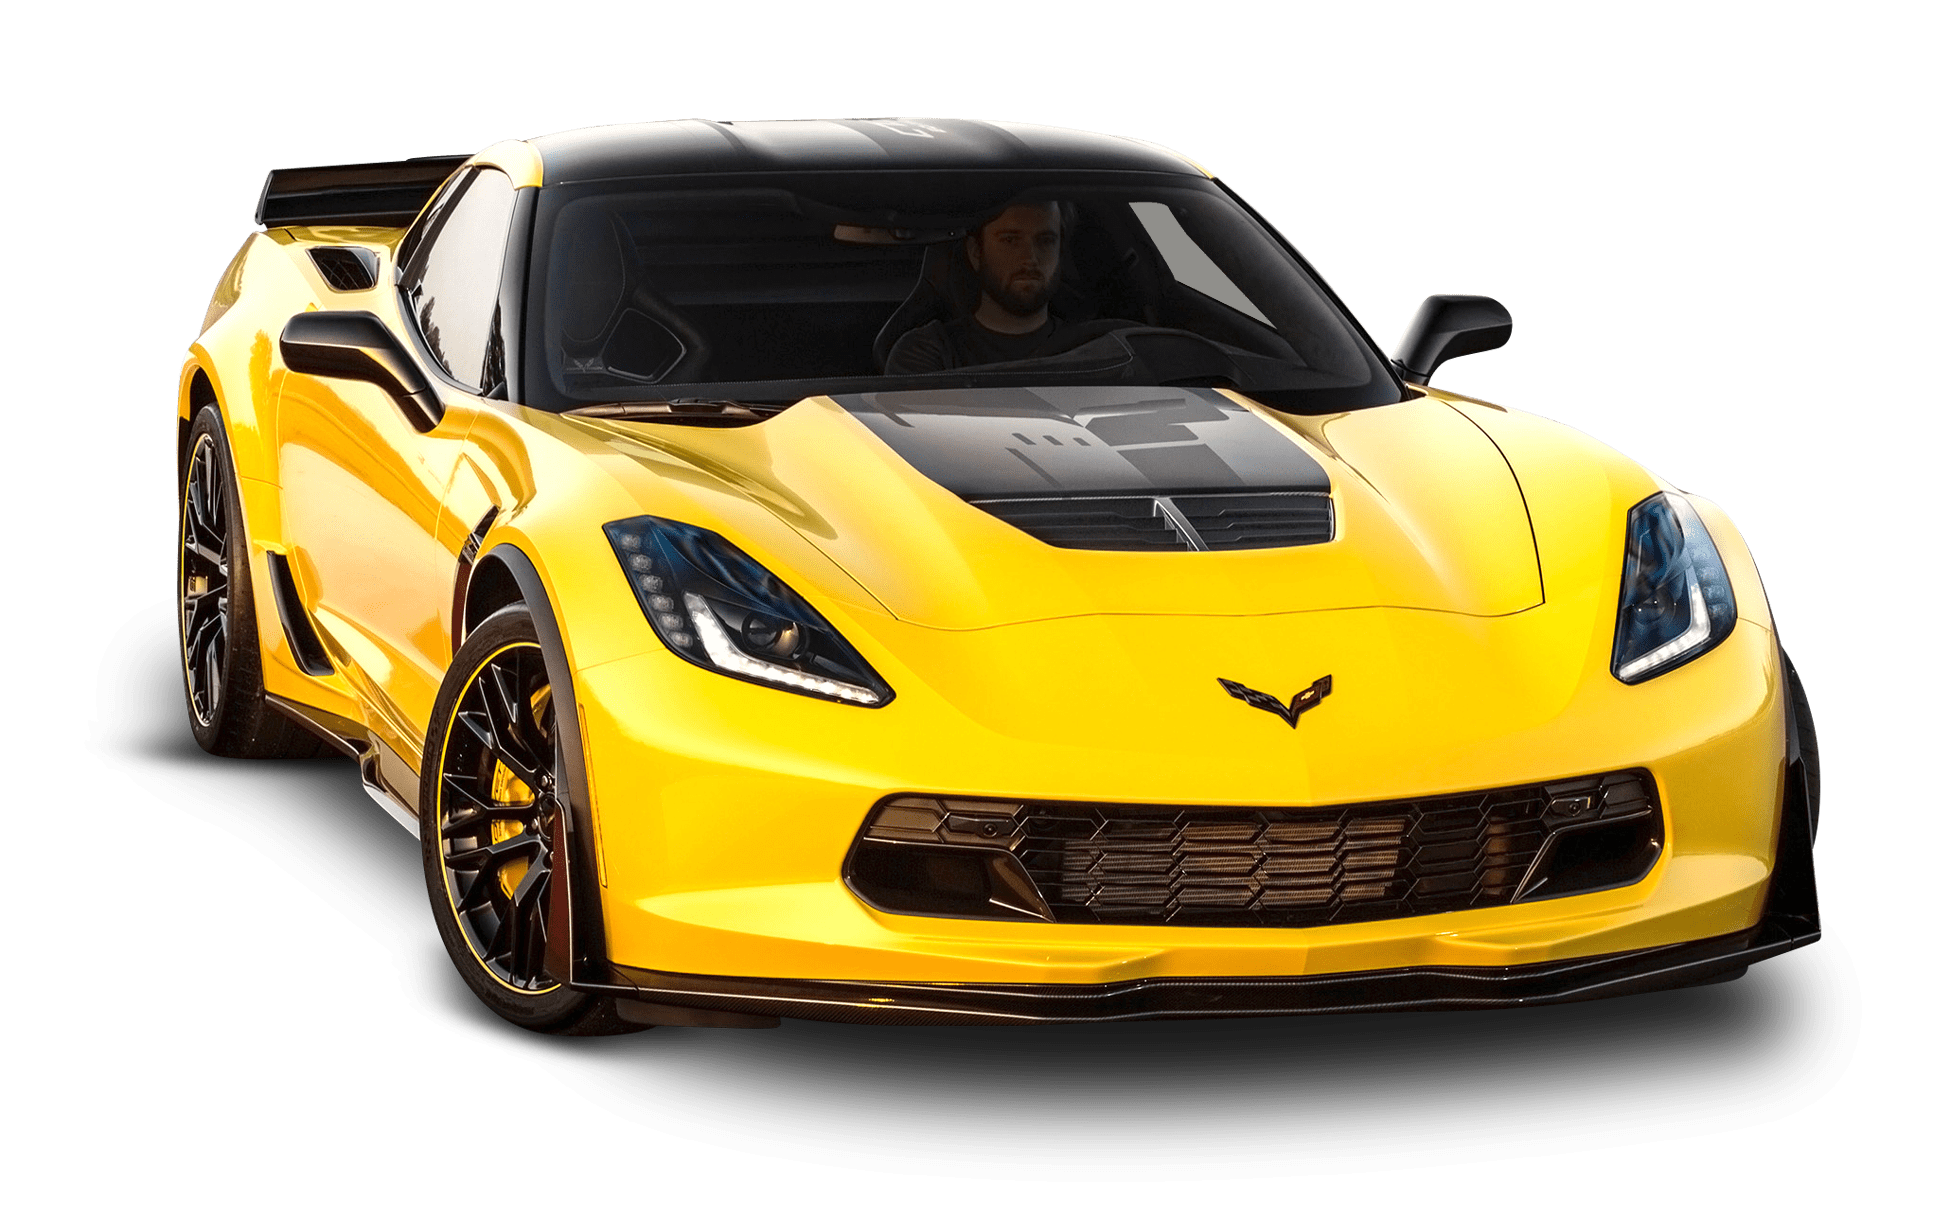 Yellow Corvette Transparent Png Stickpng